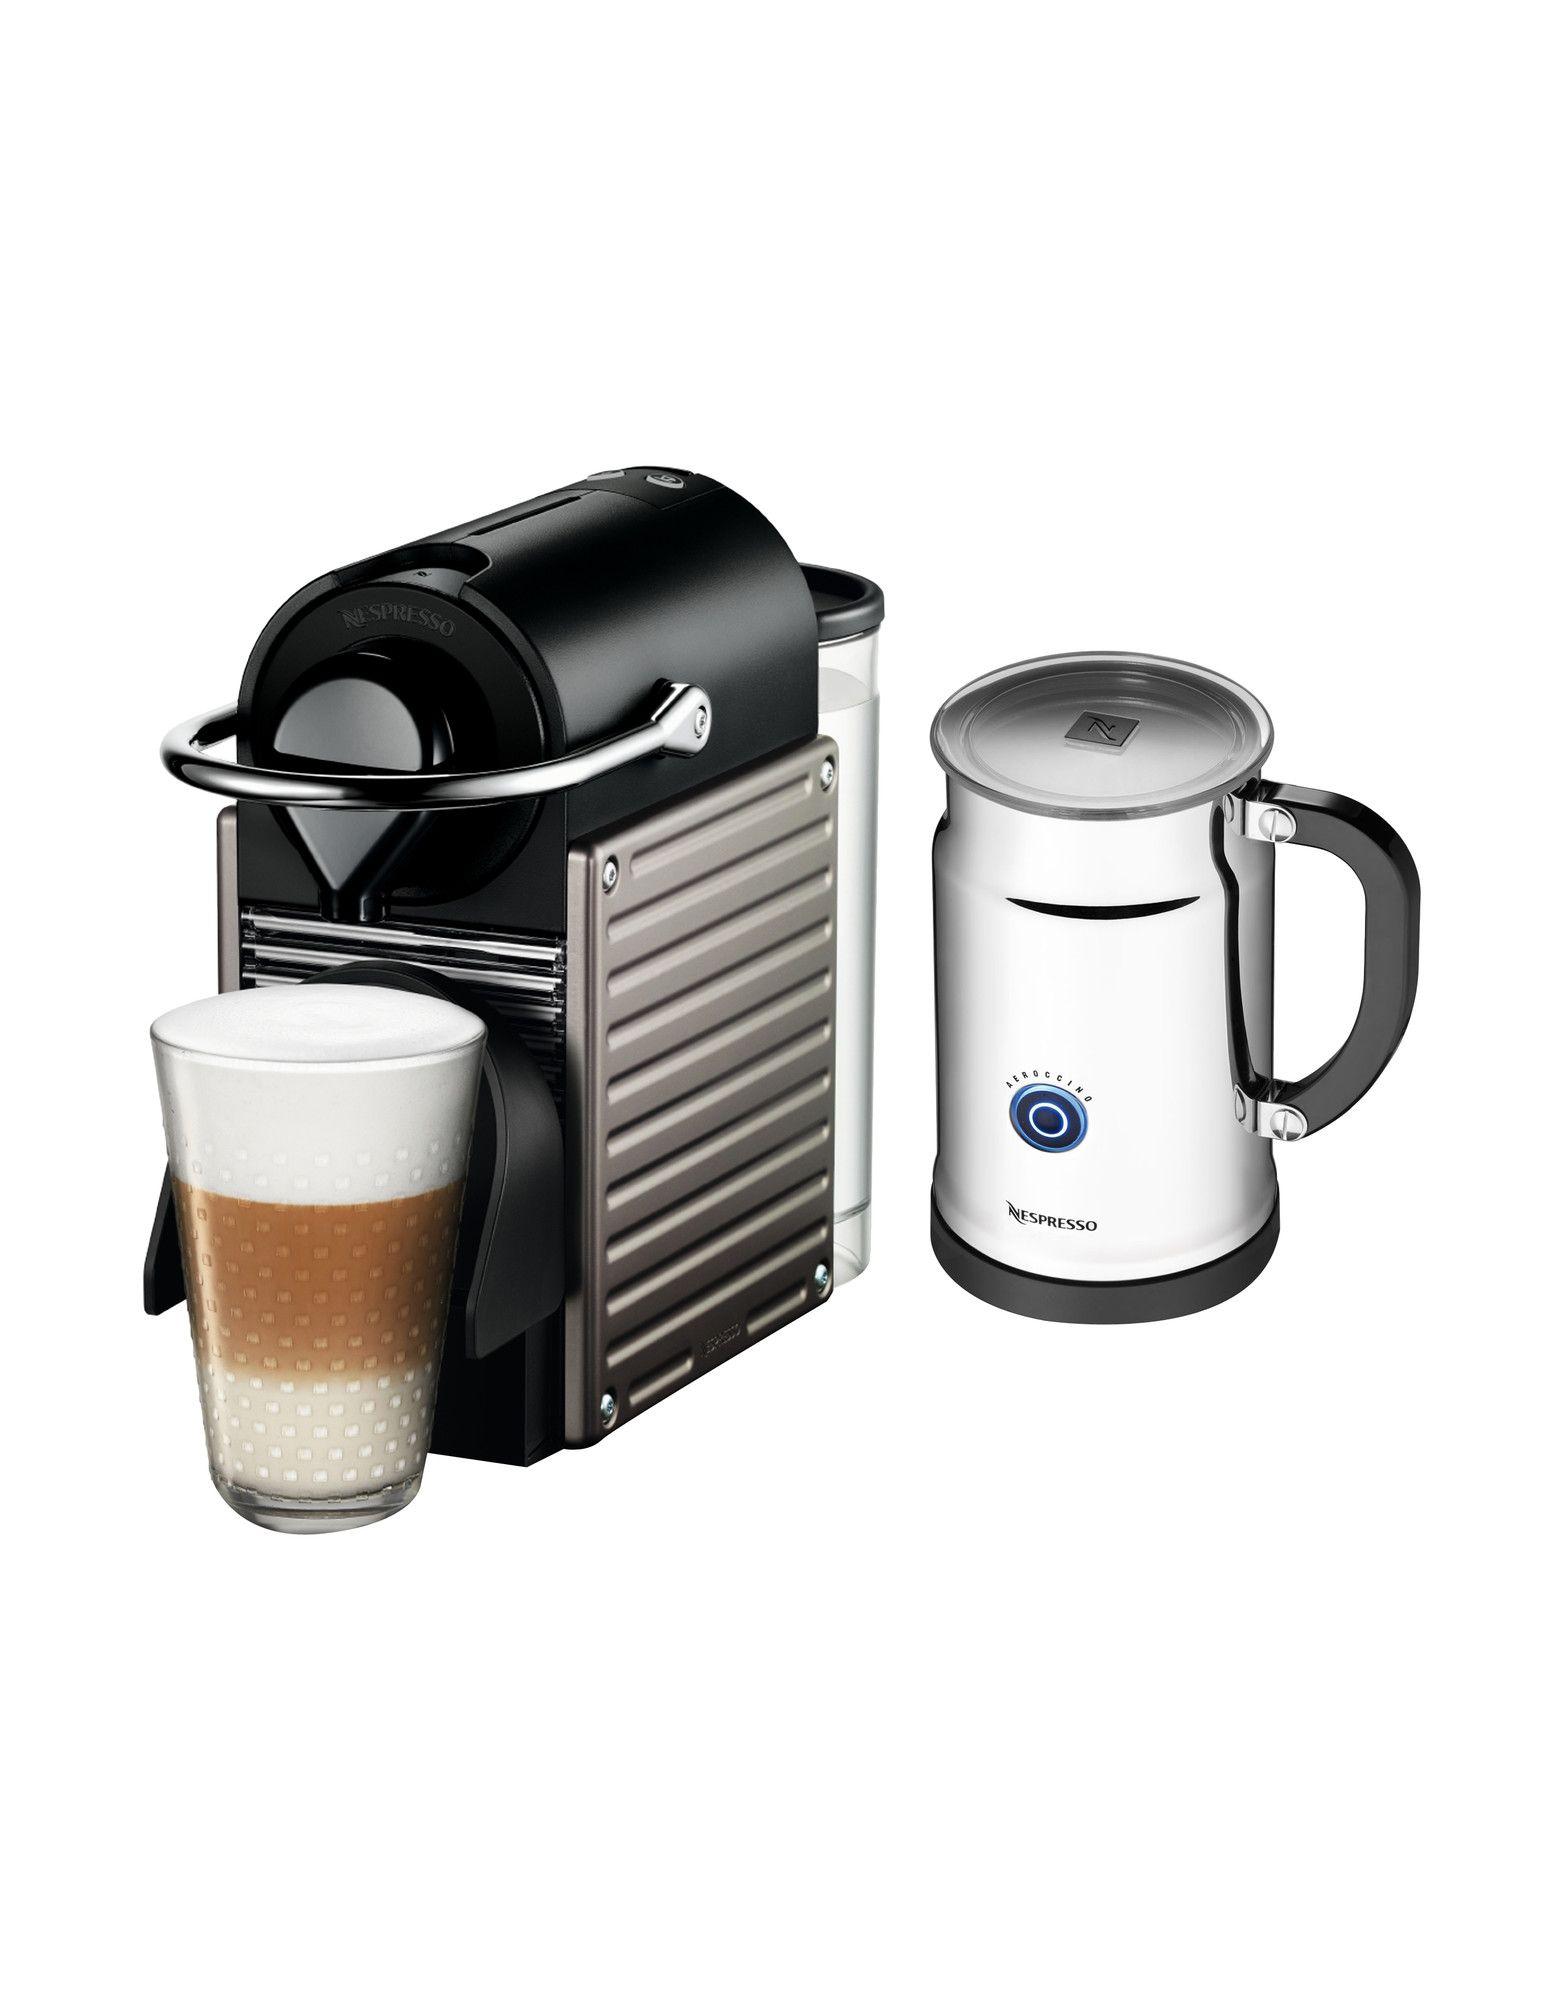 Pixie Espresso Maker with Aerocinno & Milk Frother